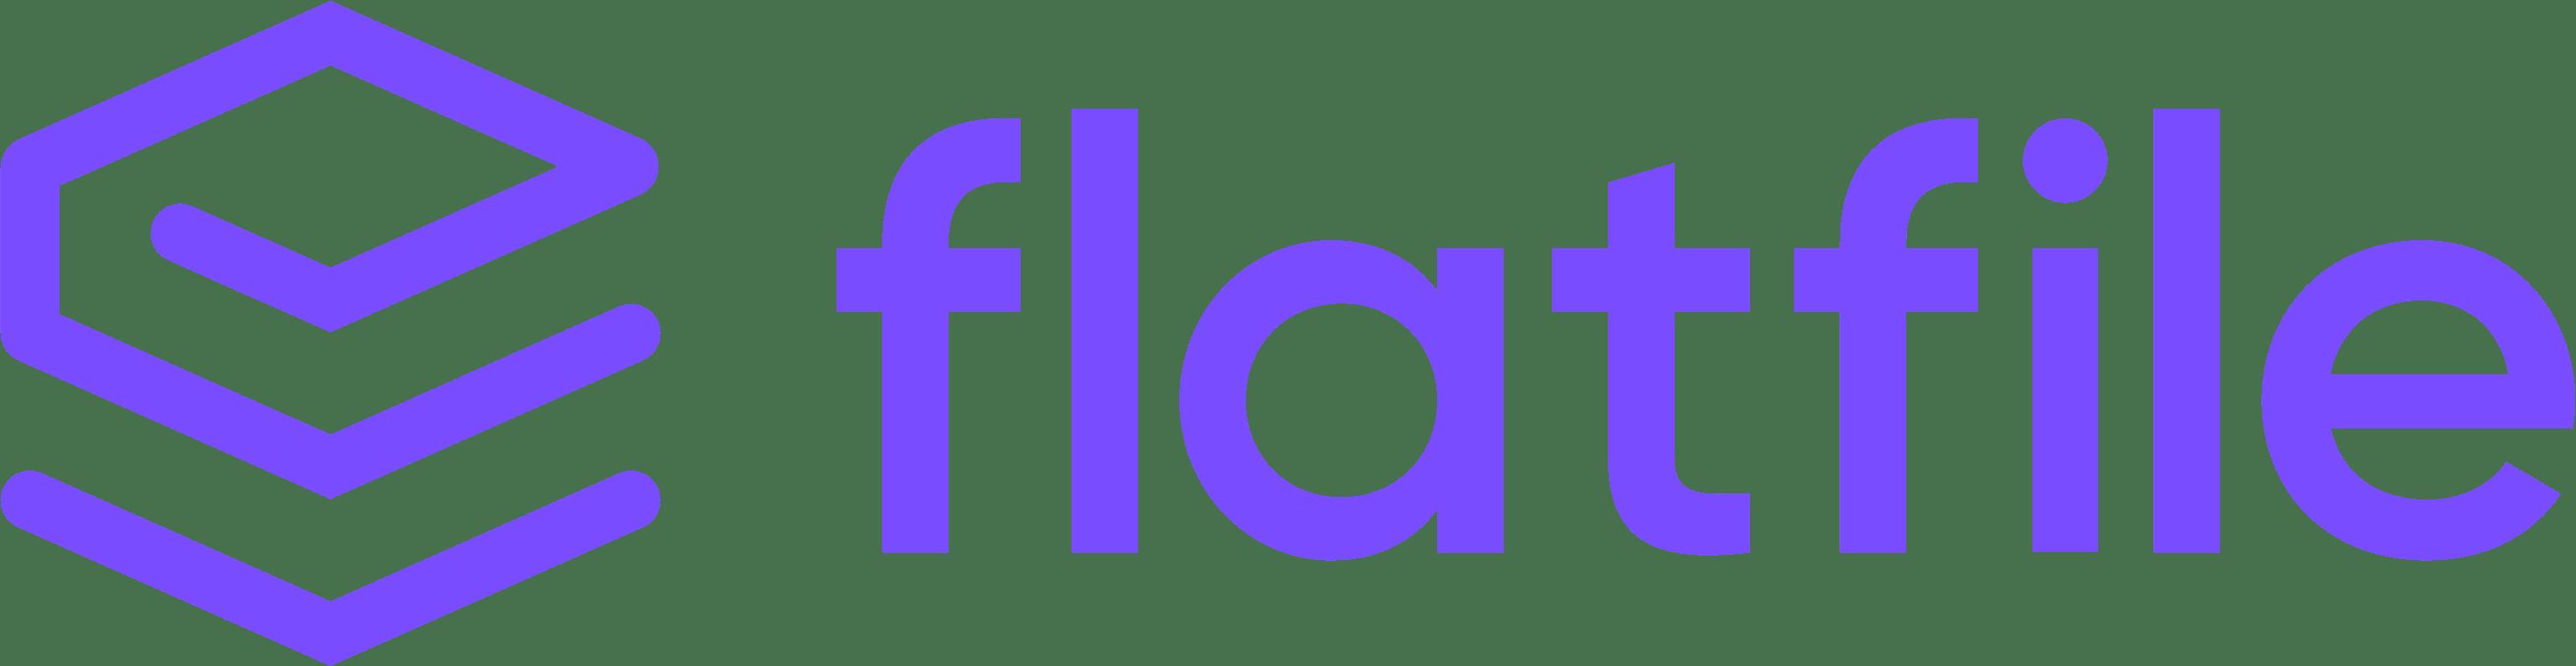 Flatfile.io logo